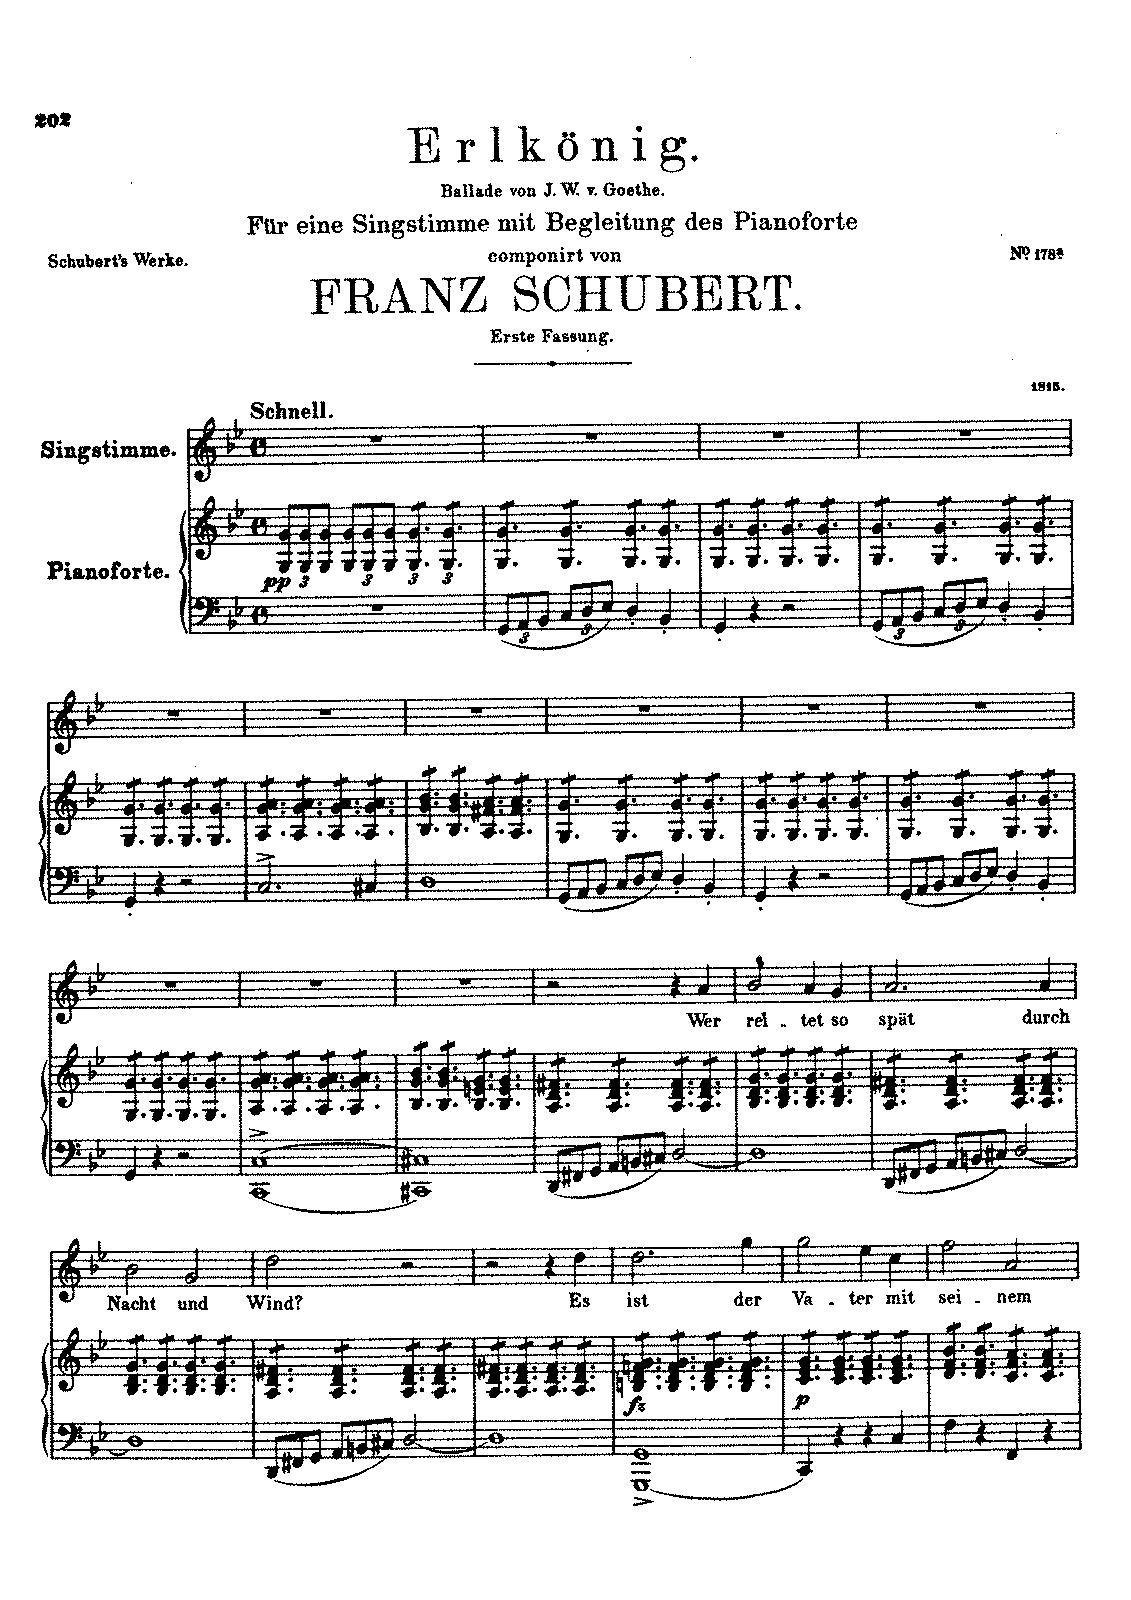 Schubert - Erlkönig